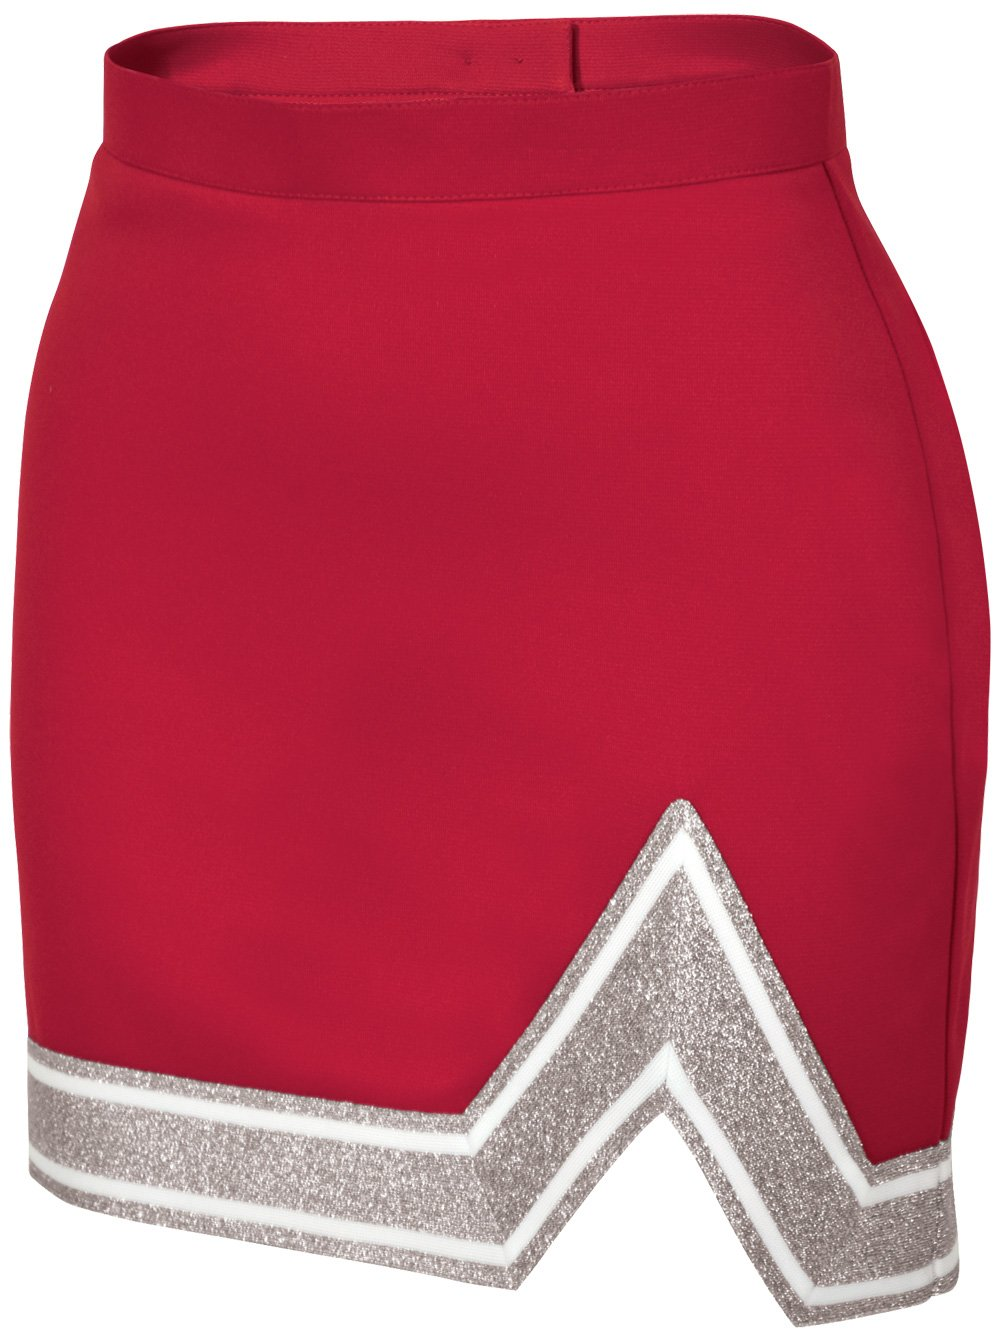 Chassé Womens' Blaze Skirt Red/White/Metallic Silver Adult X-Small